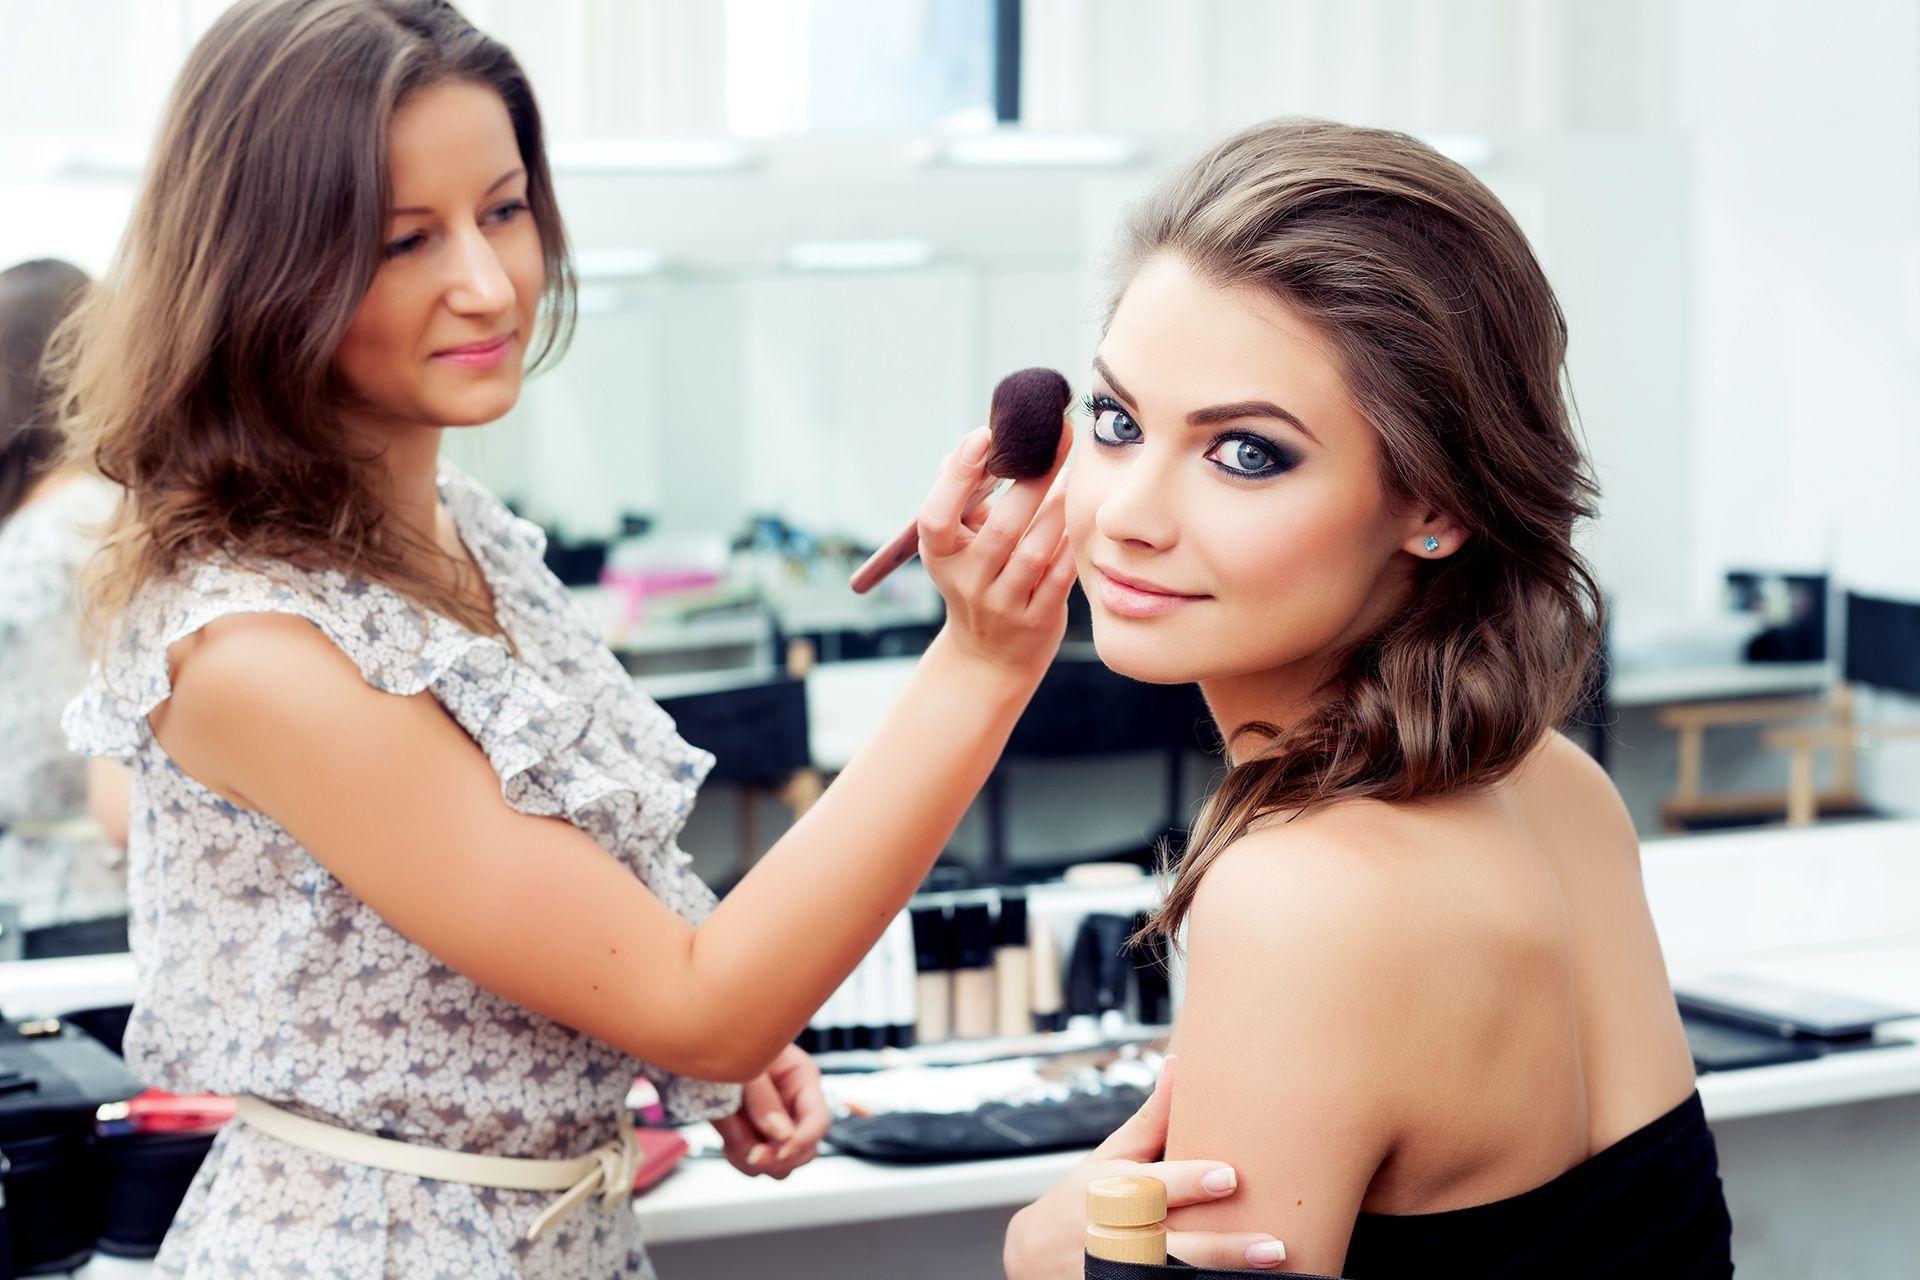 Makeup Beratung Ab 19 Schminken Vom Profi Lernen